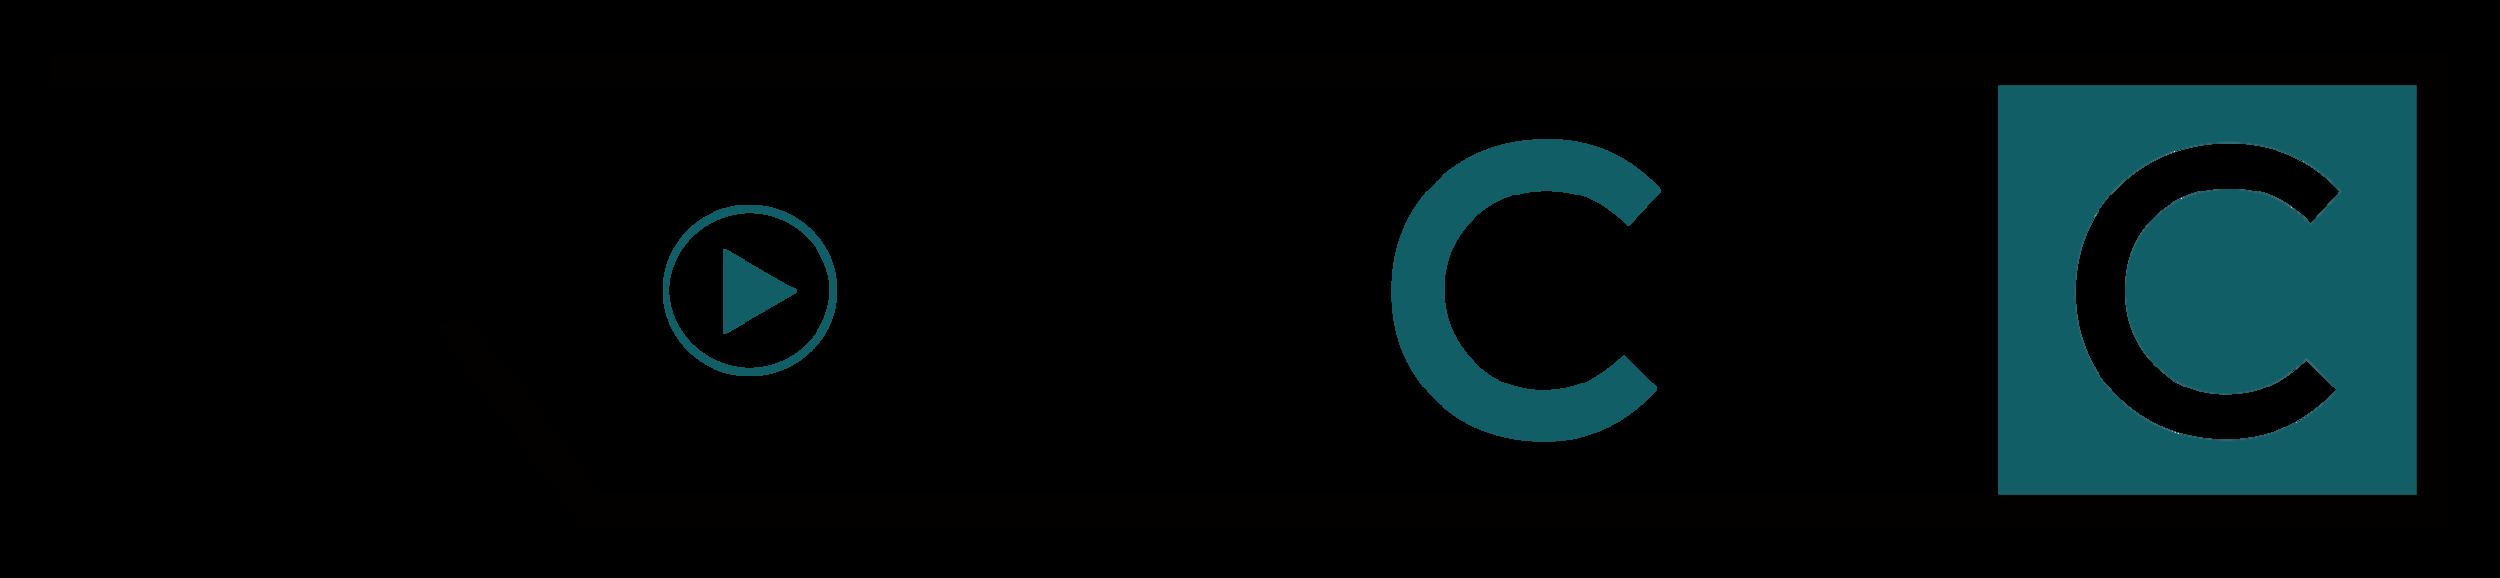 Project C Logo_FINAL.png